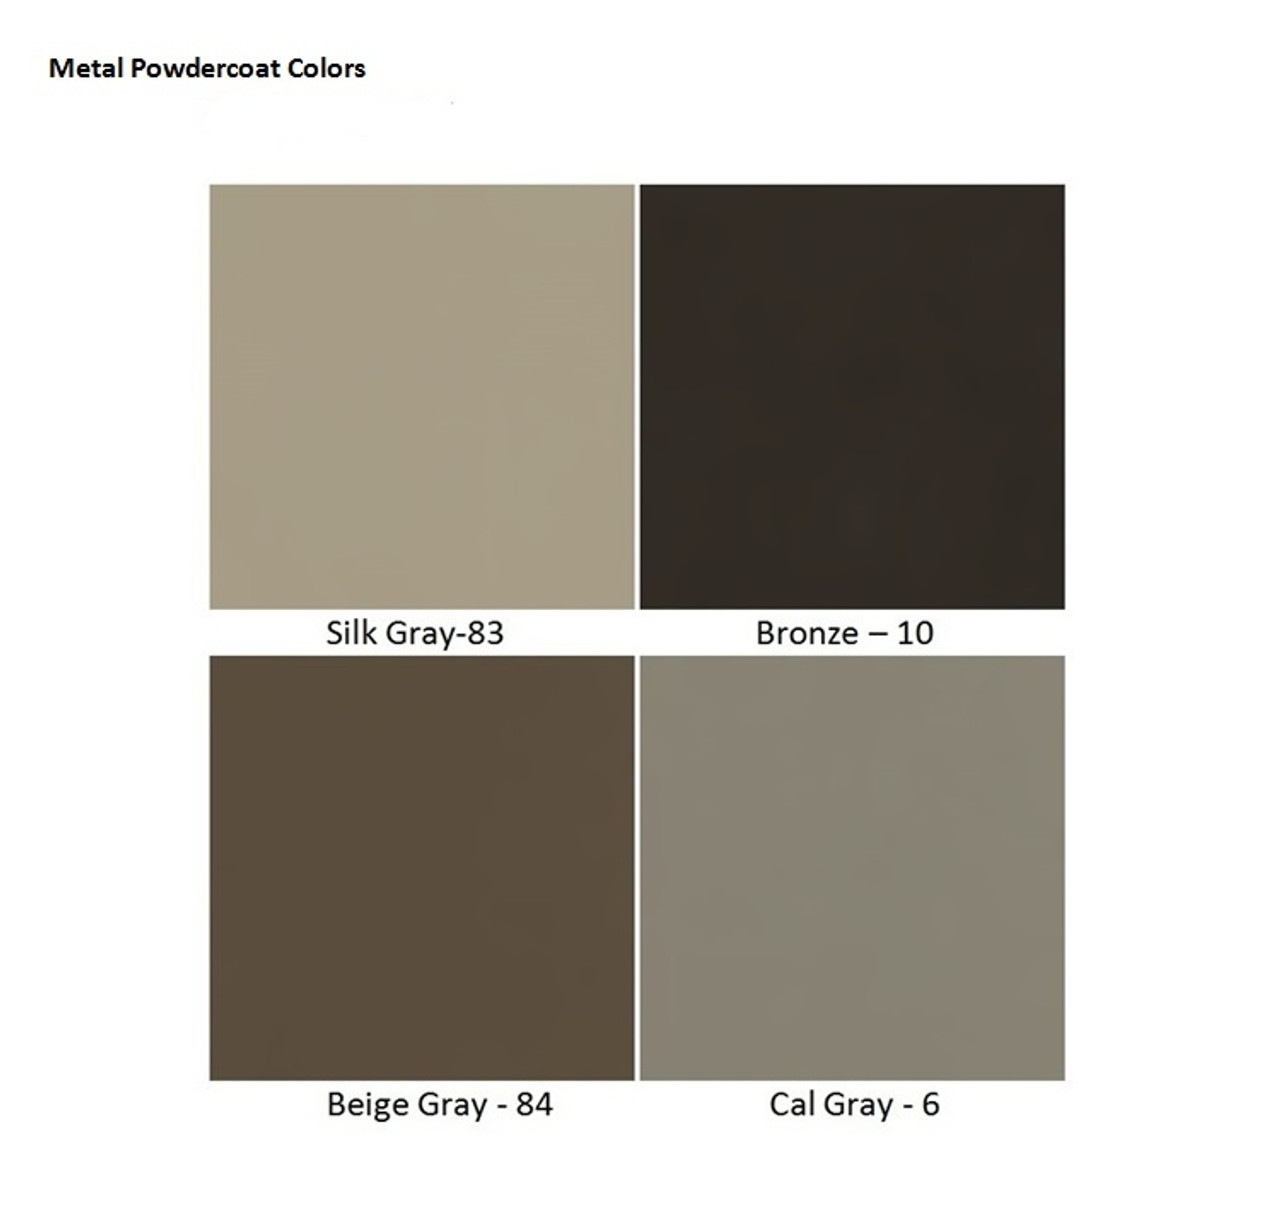 Metal Powdercoat Colors